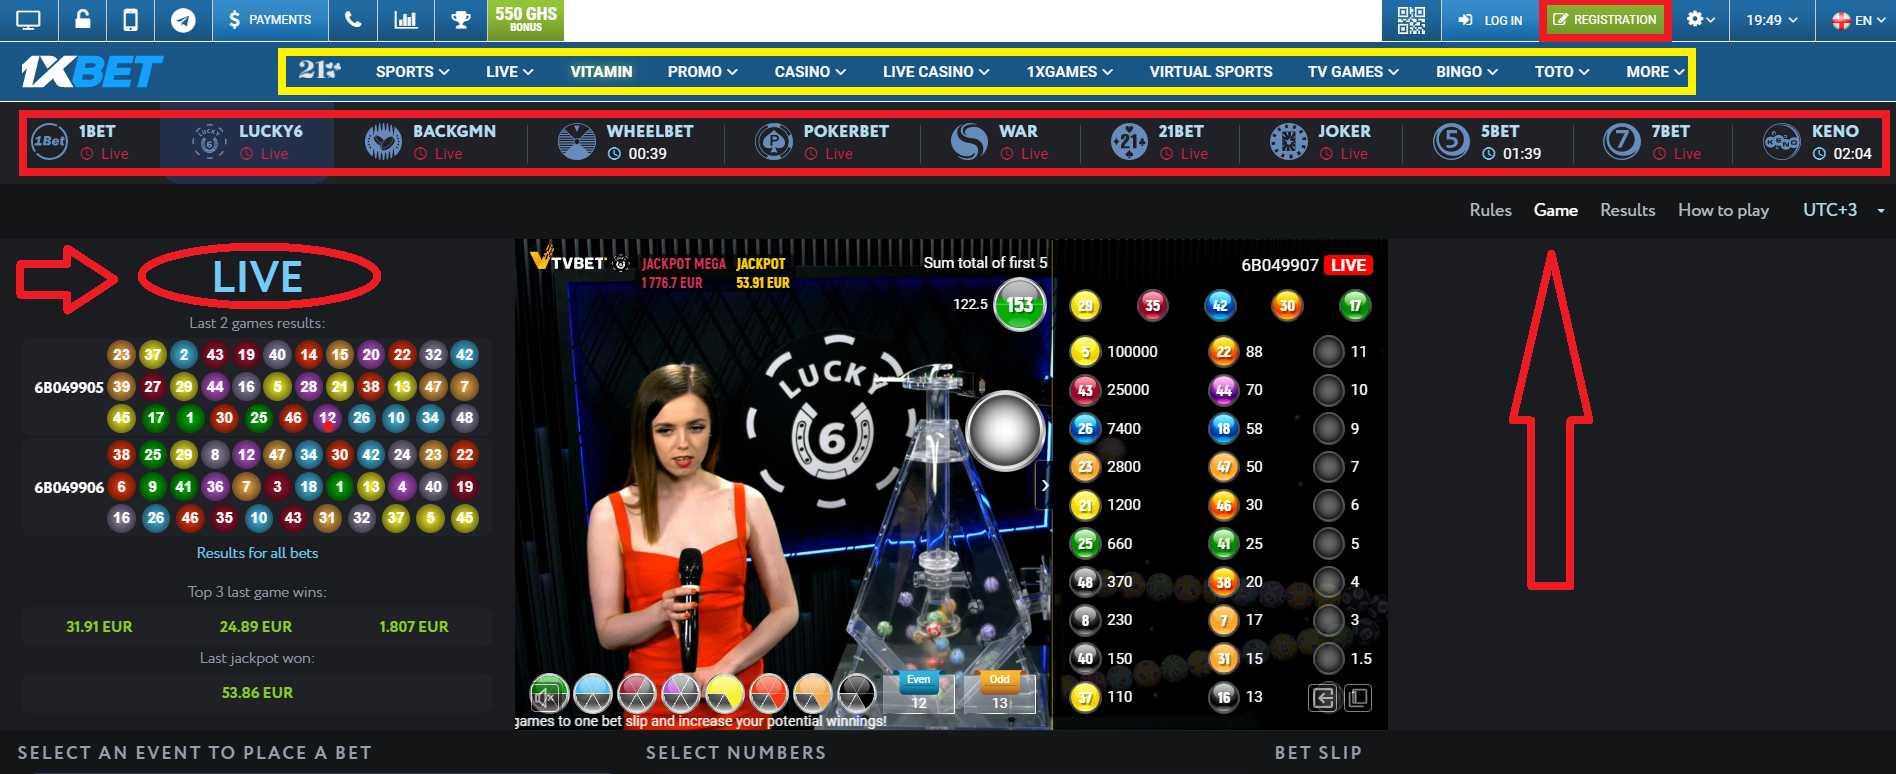 1xBet Live Stream Betting Benefits